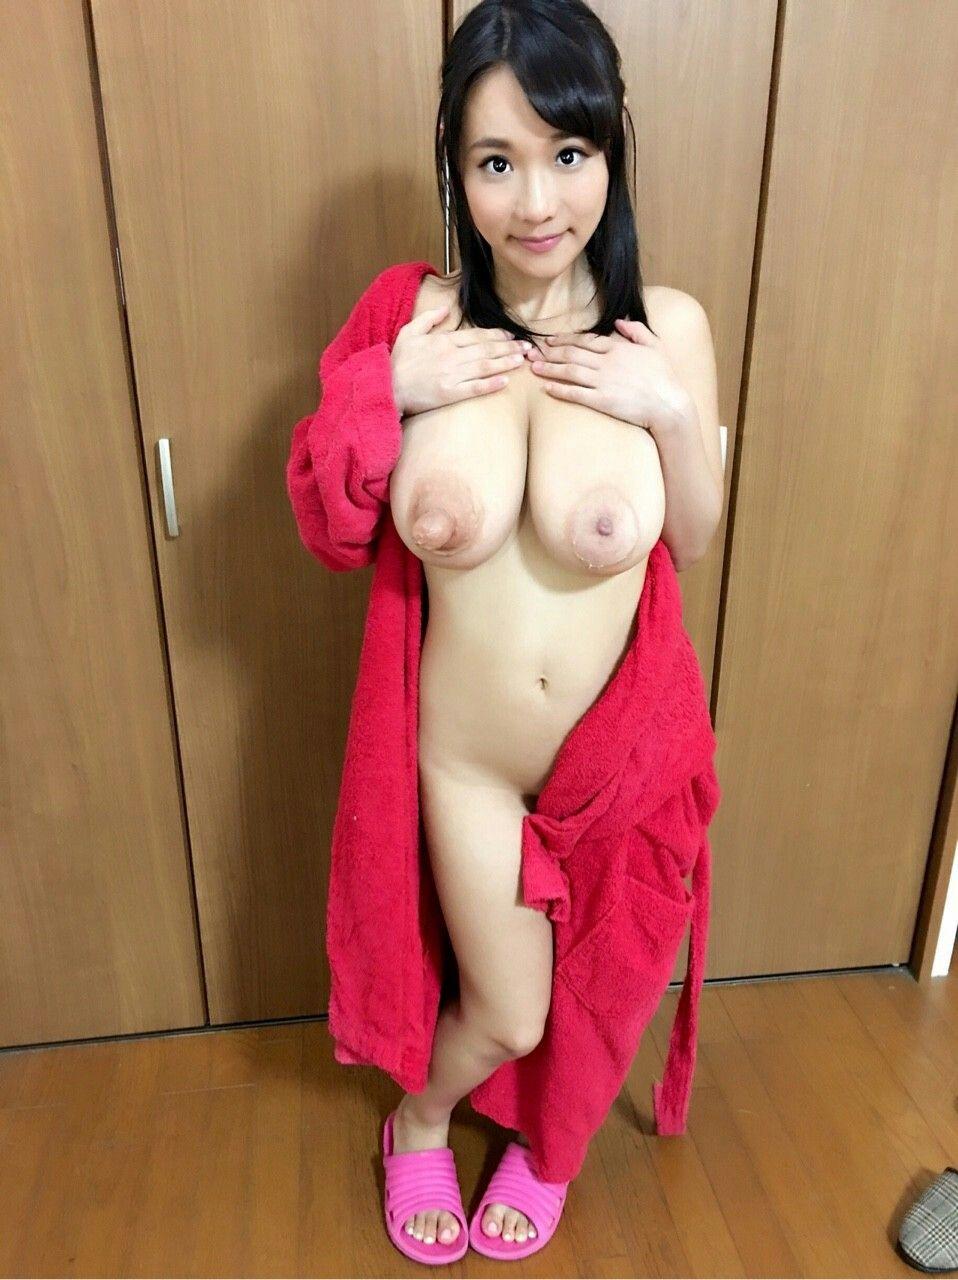 B an mitsuki konishi mika saegusa chitose hazuki mion kitajima an nishimura